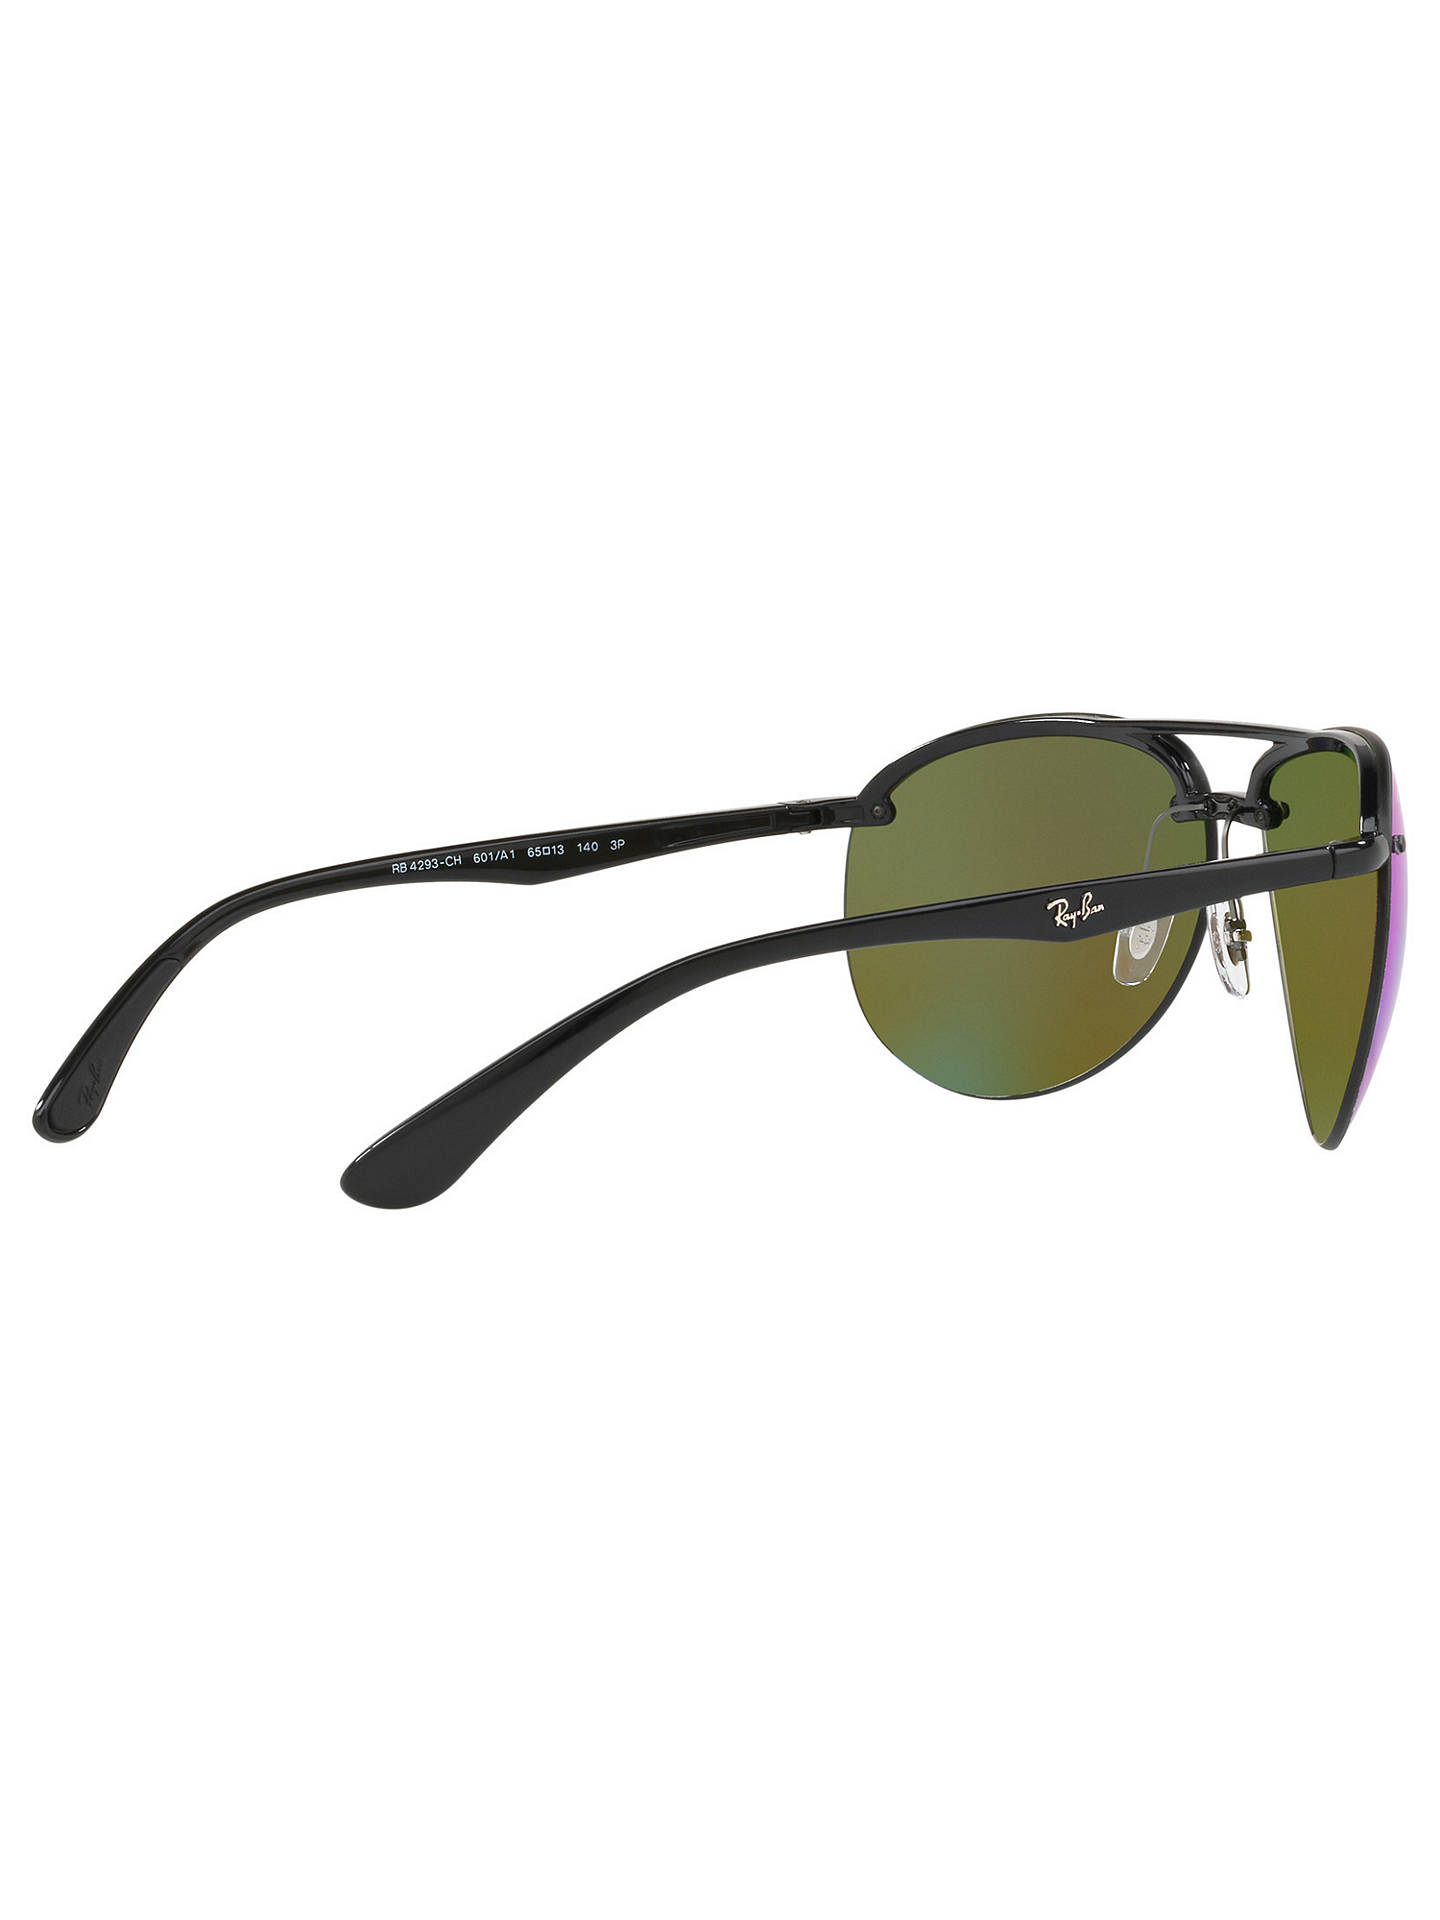 69a2d25d19c Ray-Ban RB4293CH Chromance Polarised Aviator Sunglasses at John ...